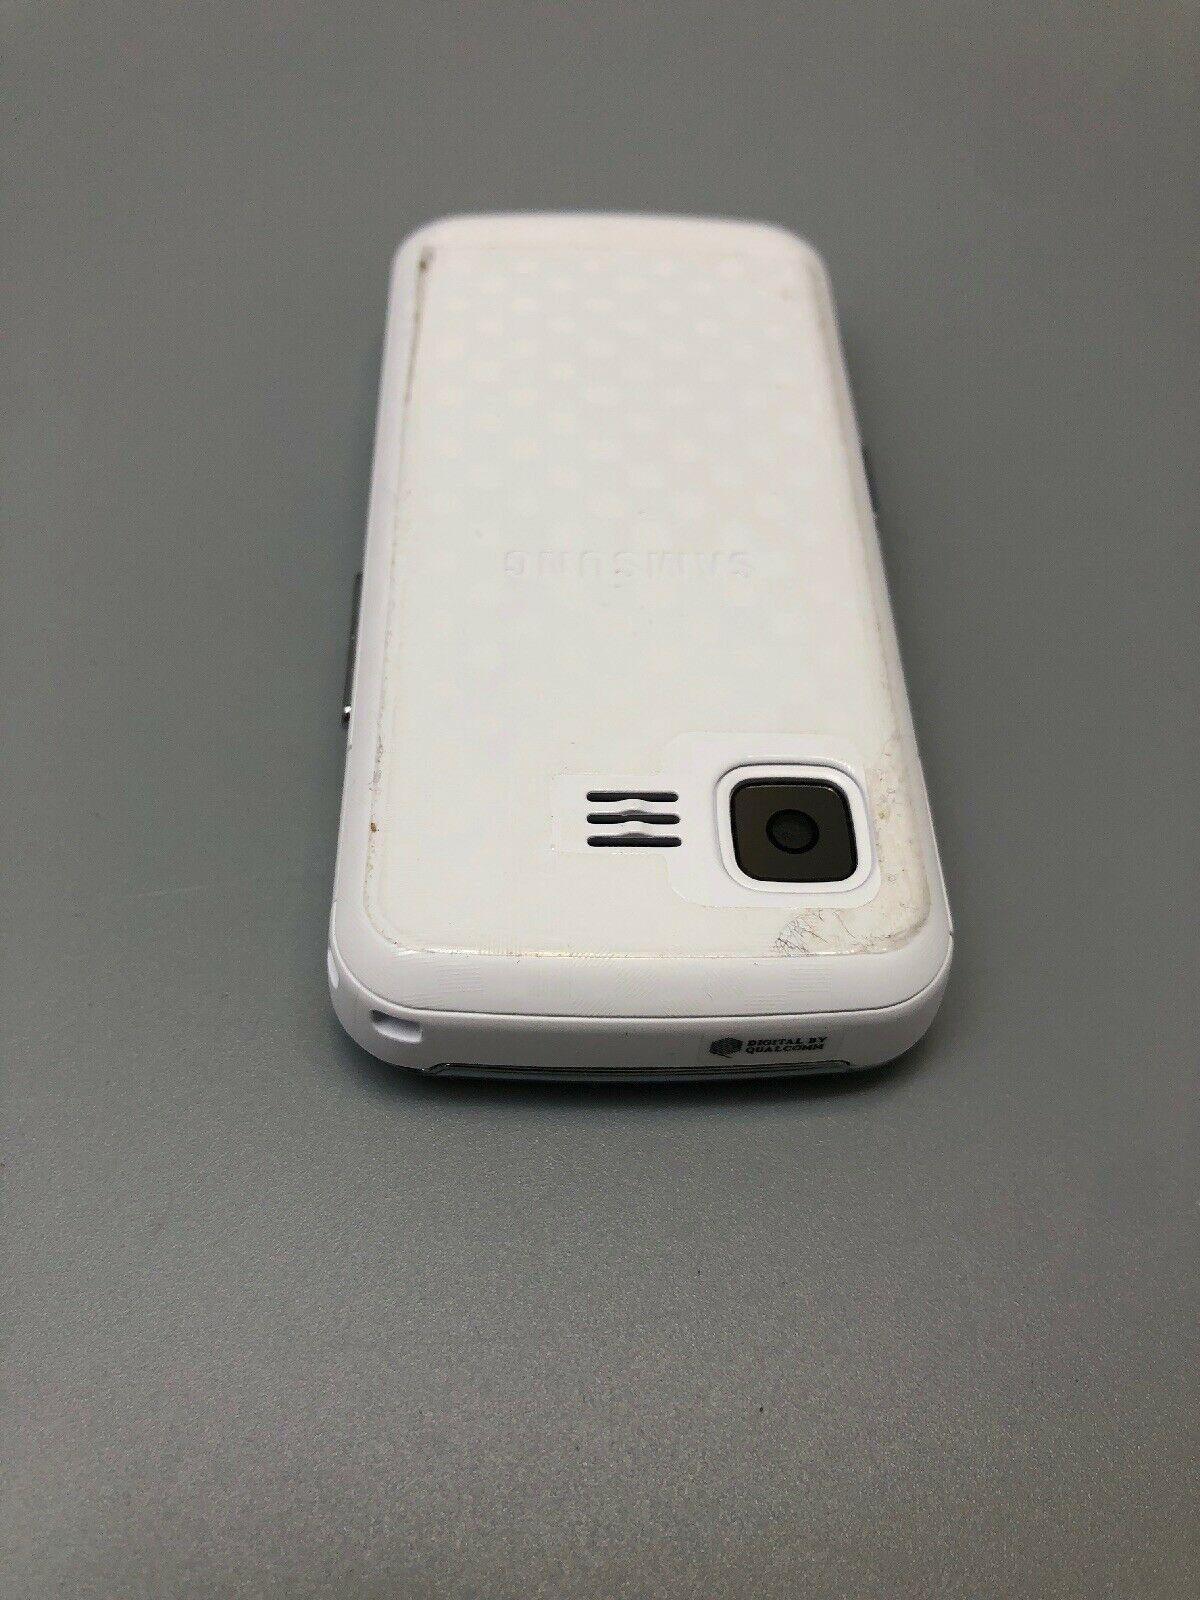 Samsung SPH M330 - White Silver (Sprint) Cellular Phone Slide